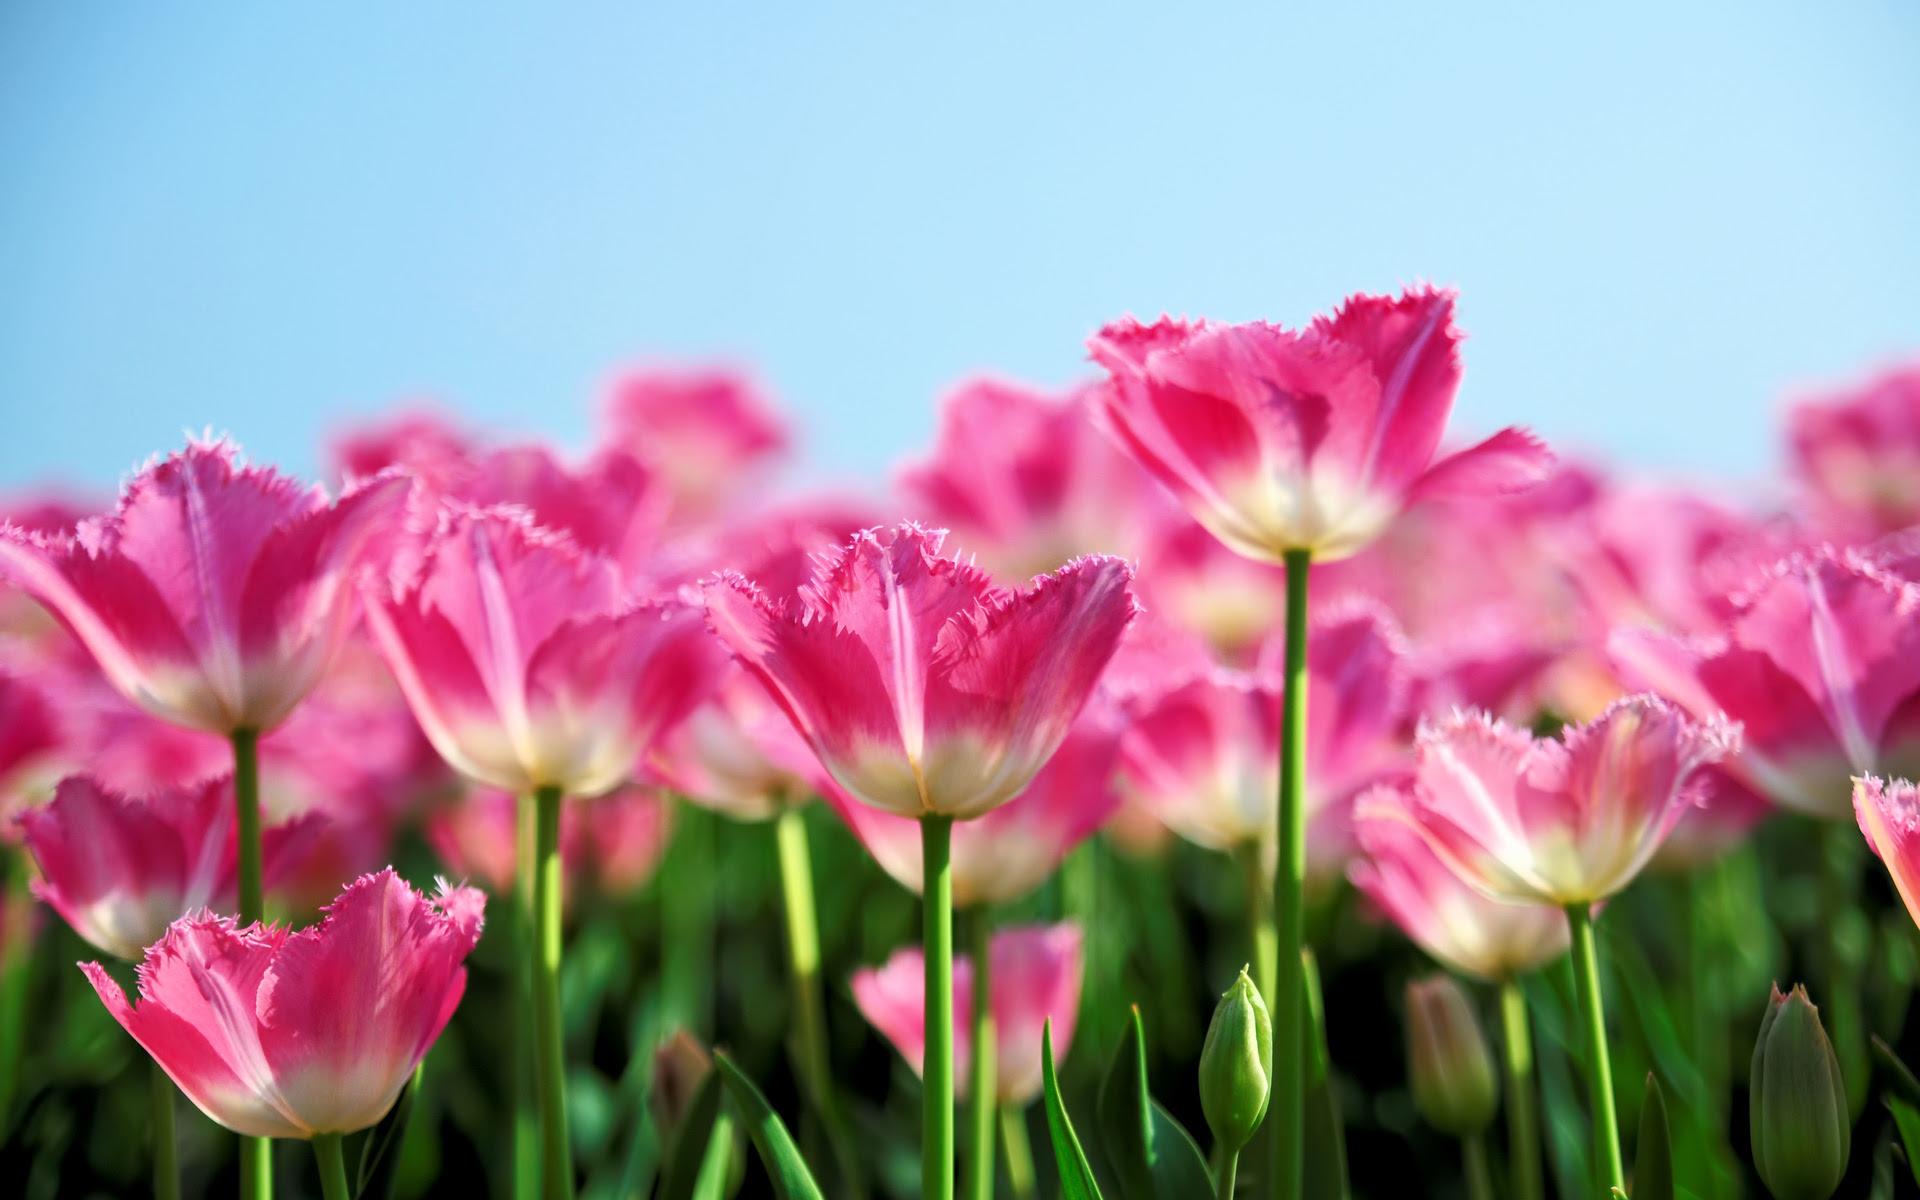 Nature flowers pink petals plants fields sky contrast wallpaper ...